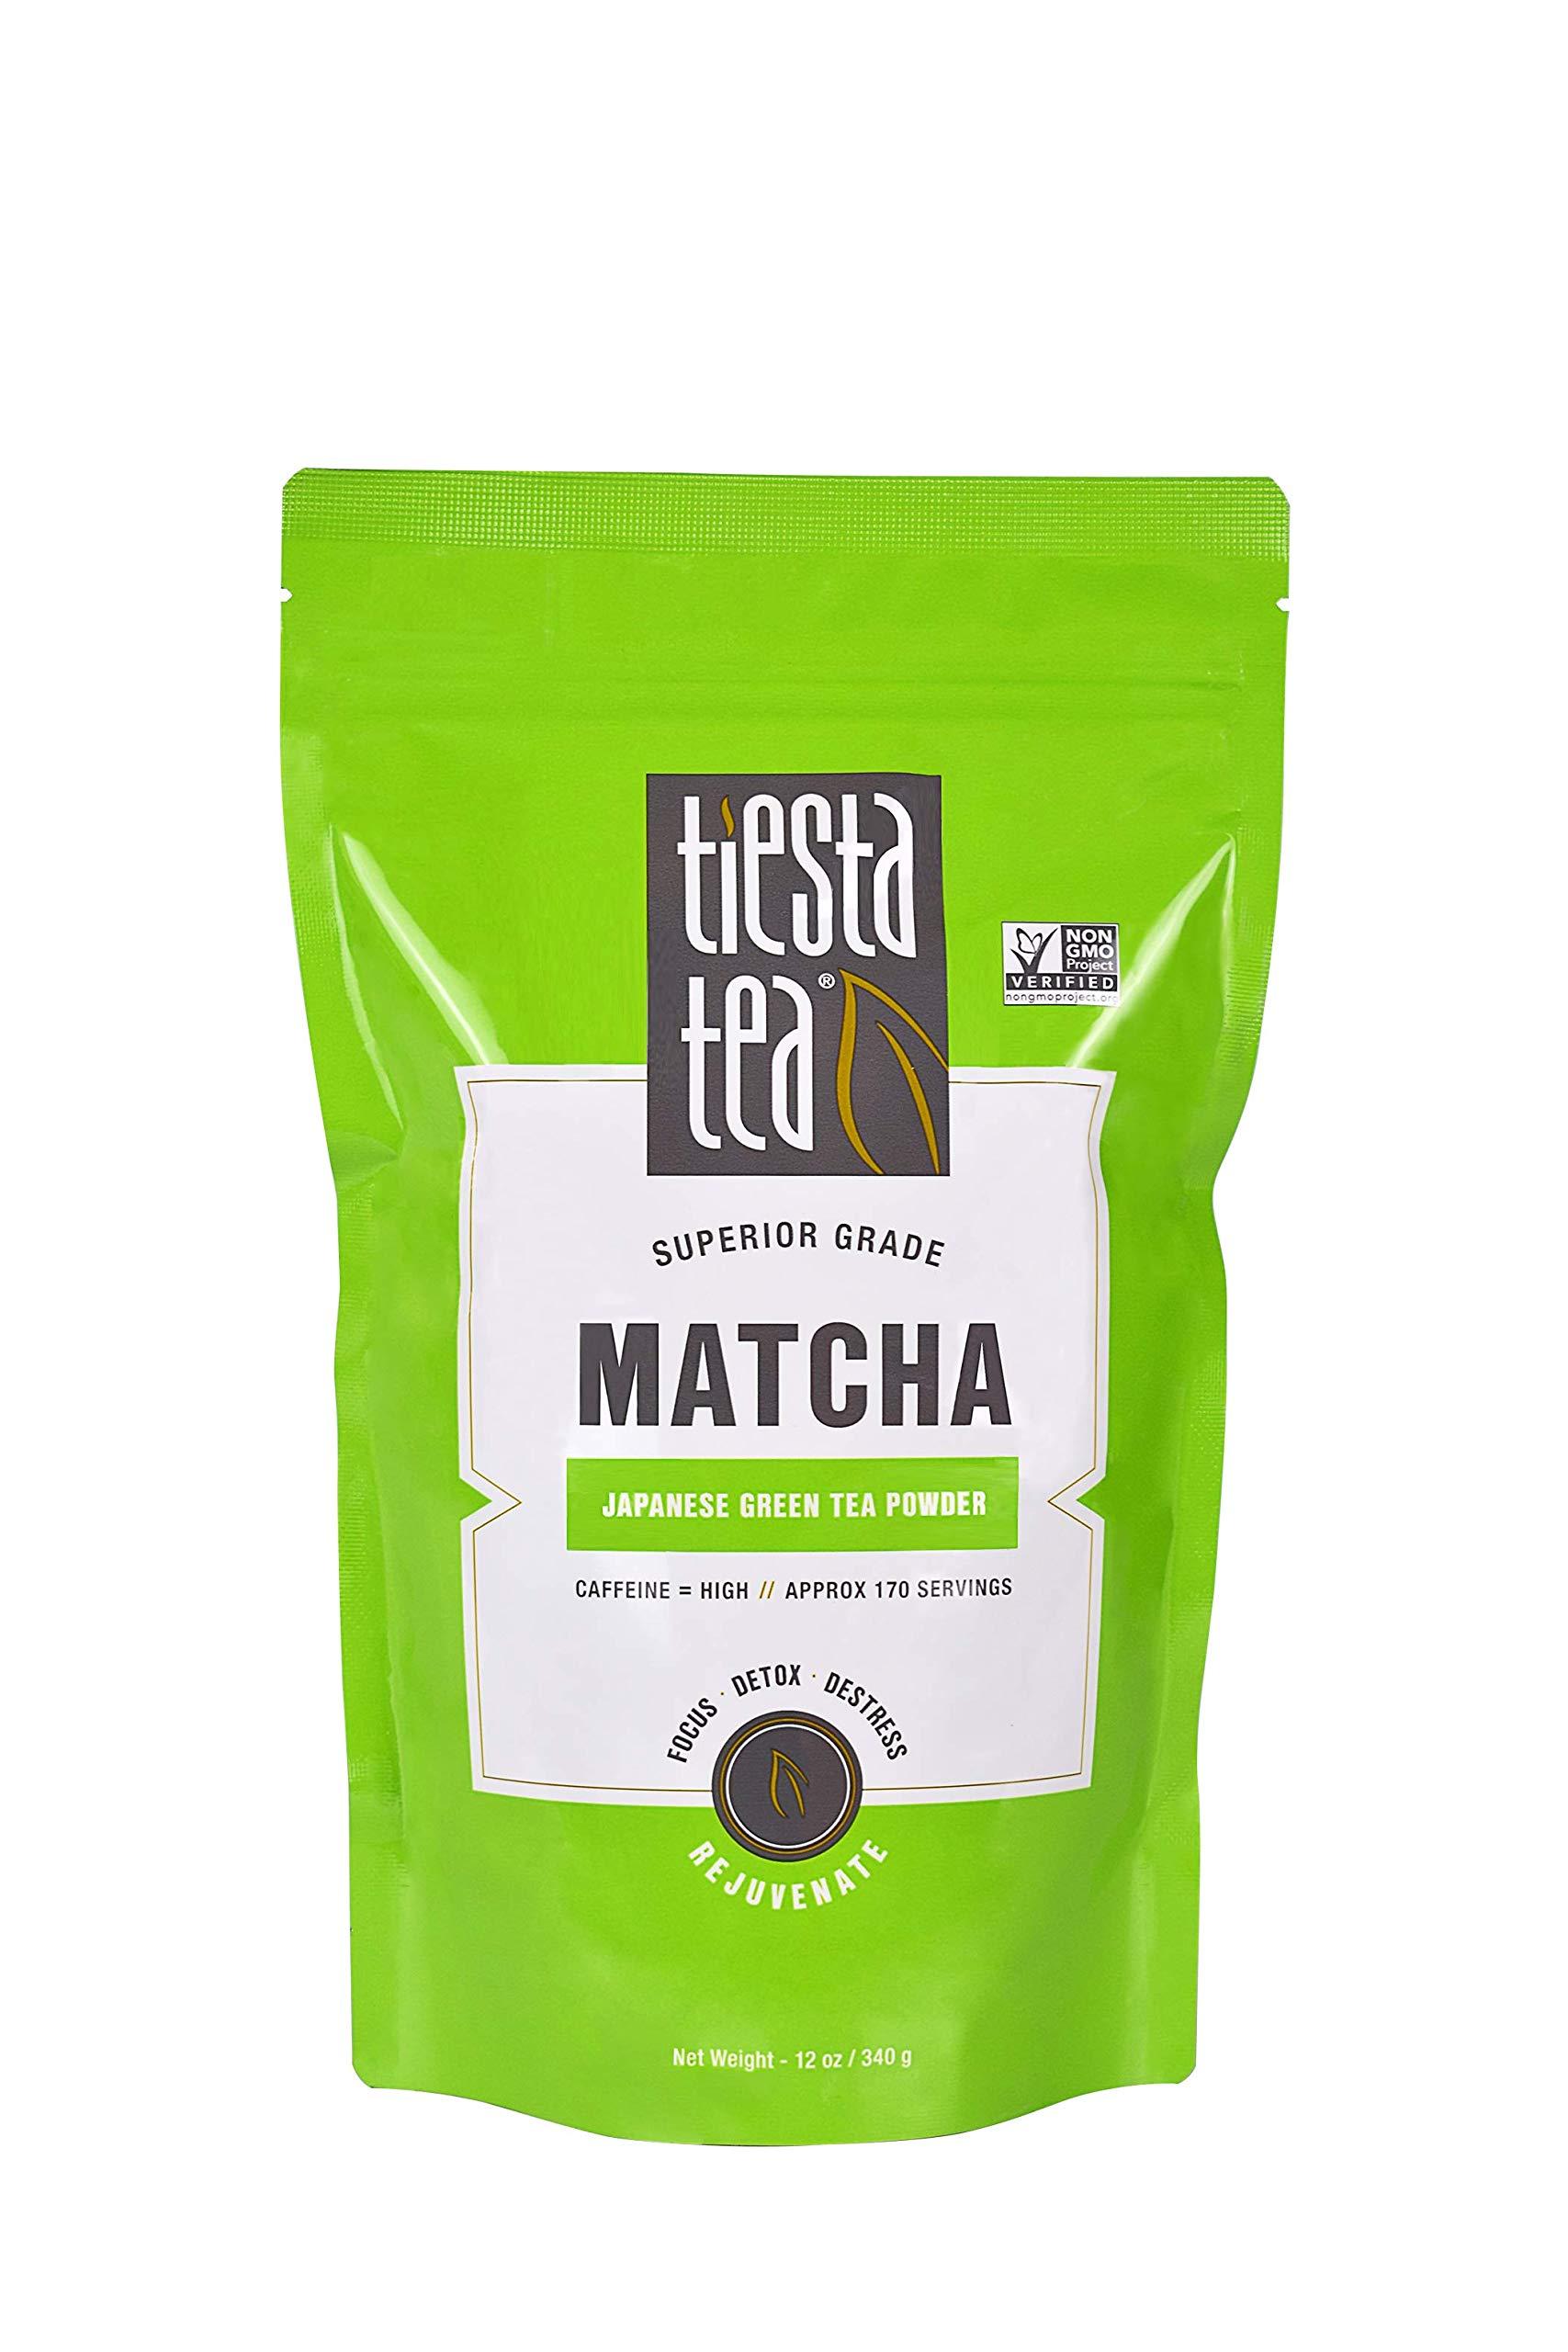 Tiesta Tea Matcha, Japanese Green Tea Powder, 12 Ounce Pouch (170 Servings) High Caffeine, Non-GMO